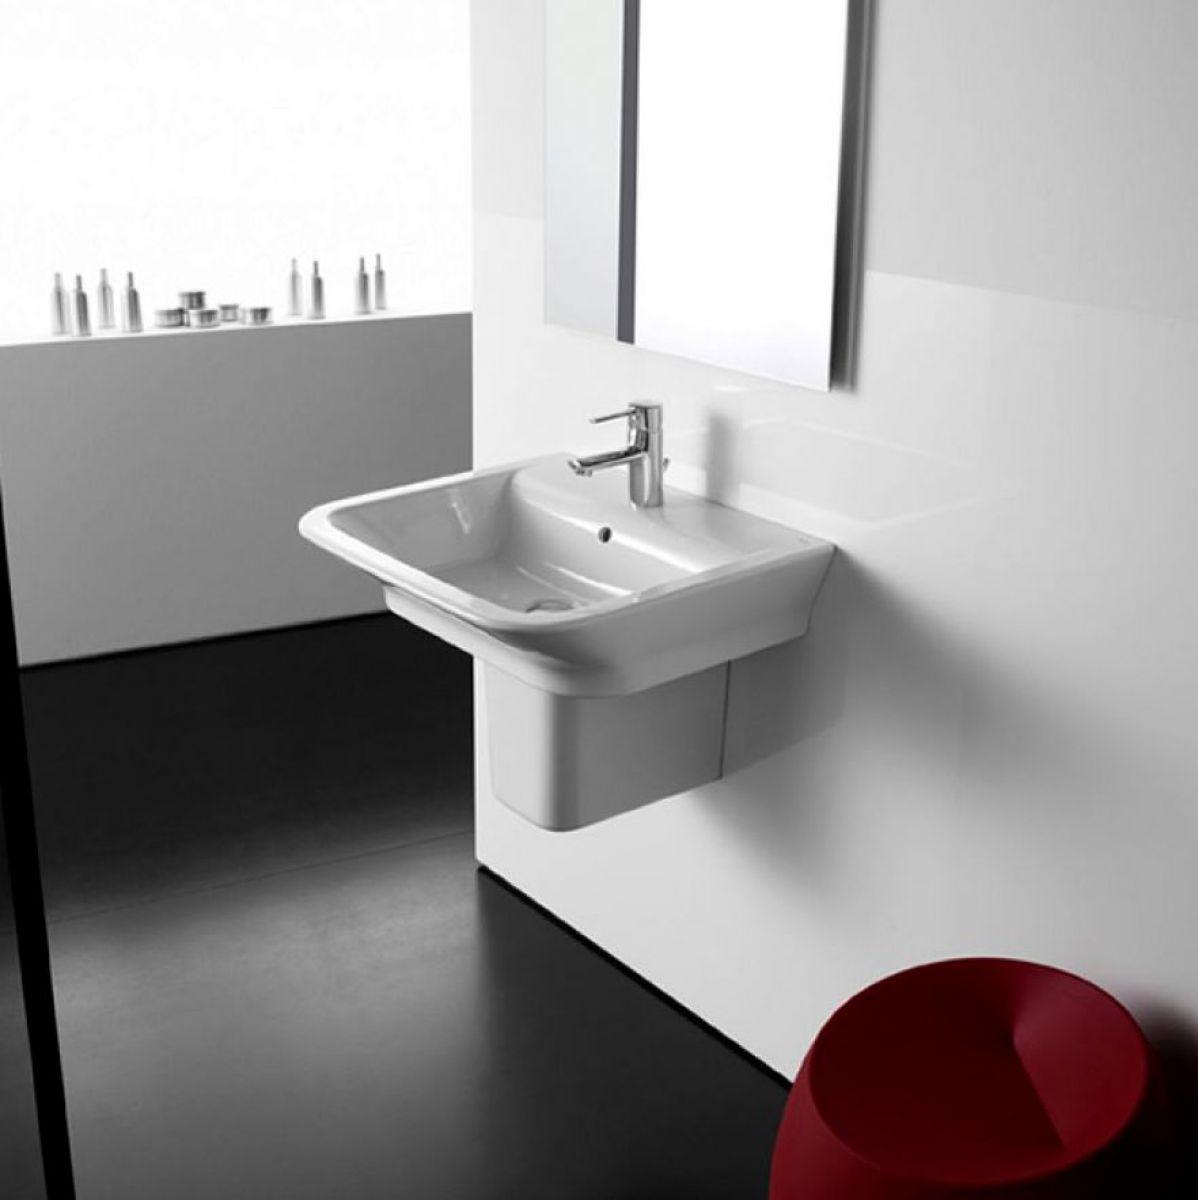 roca the gap bathroom basin uk bathrooms. Black Bedroom Furniture Sets. Home Design Ideas